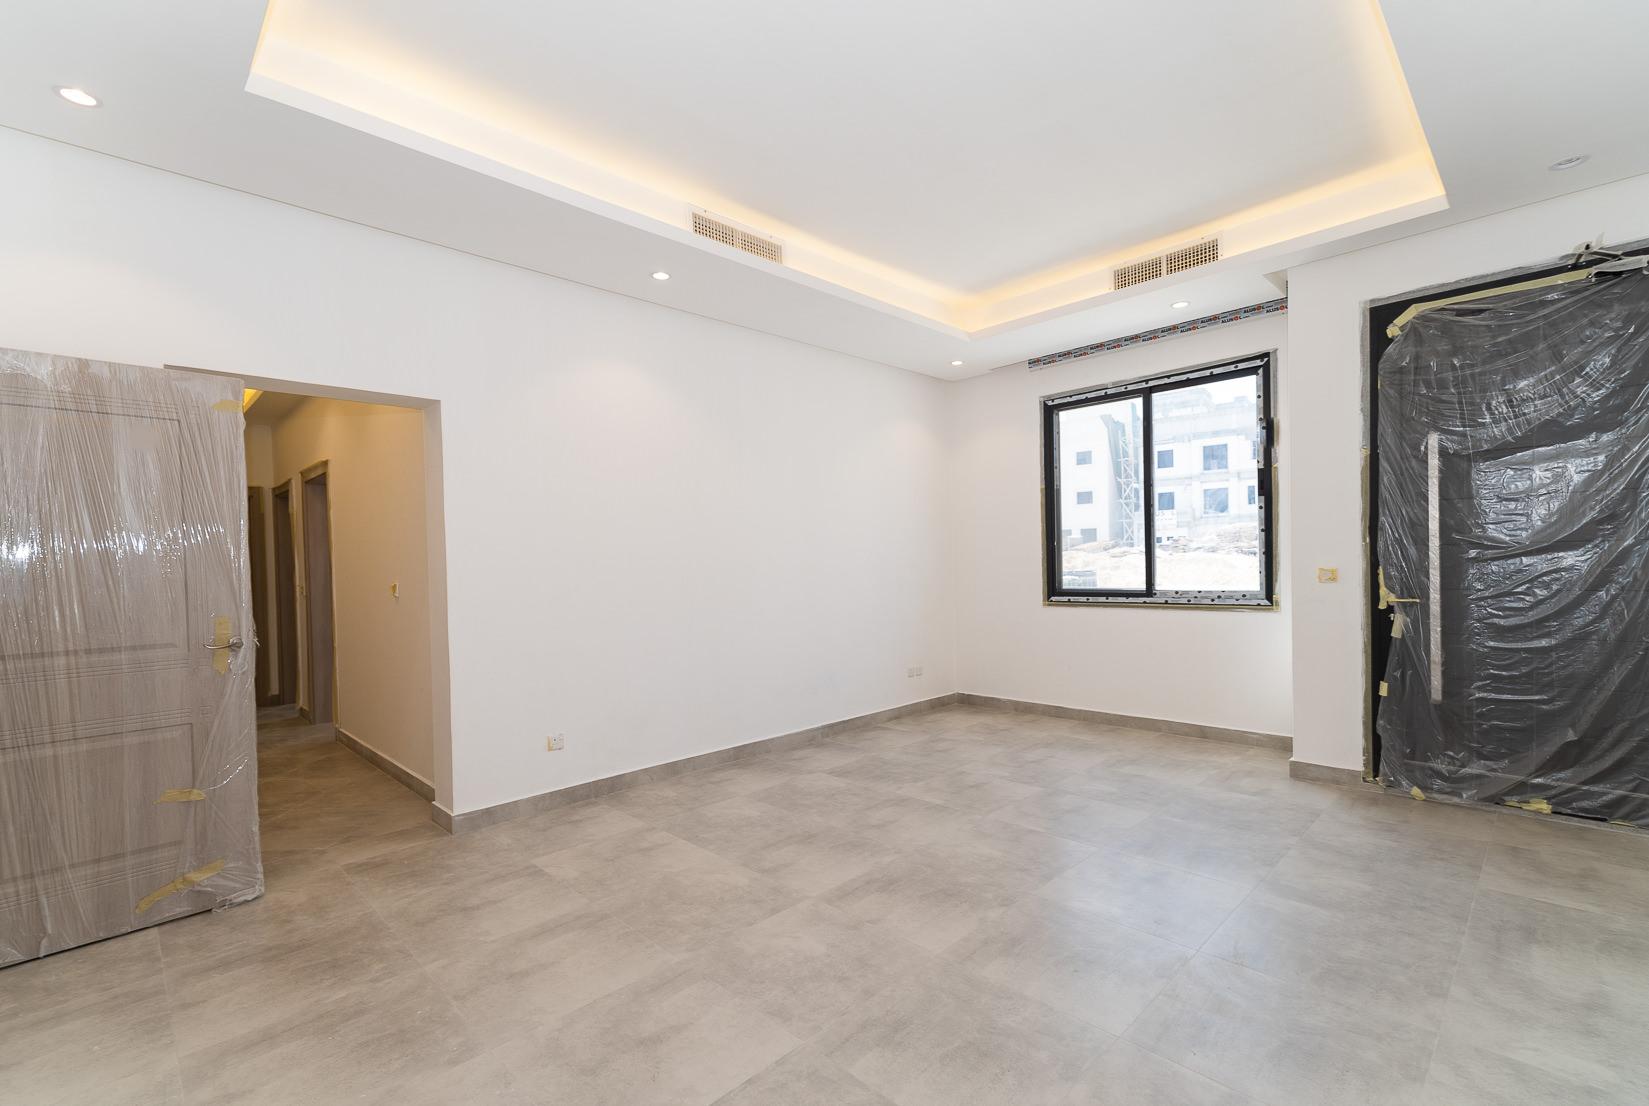 Fnaitees – new, unfurnished, three bedroom apartments